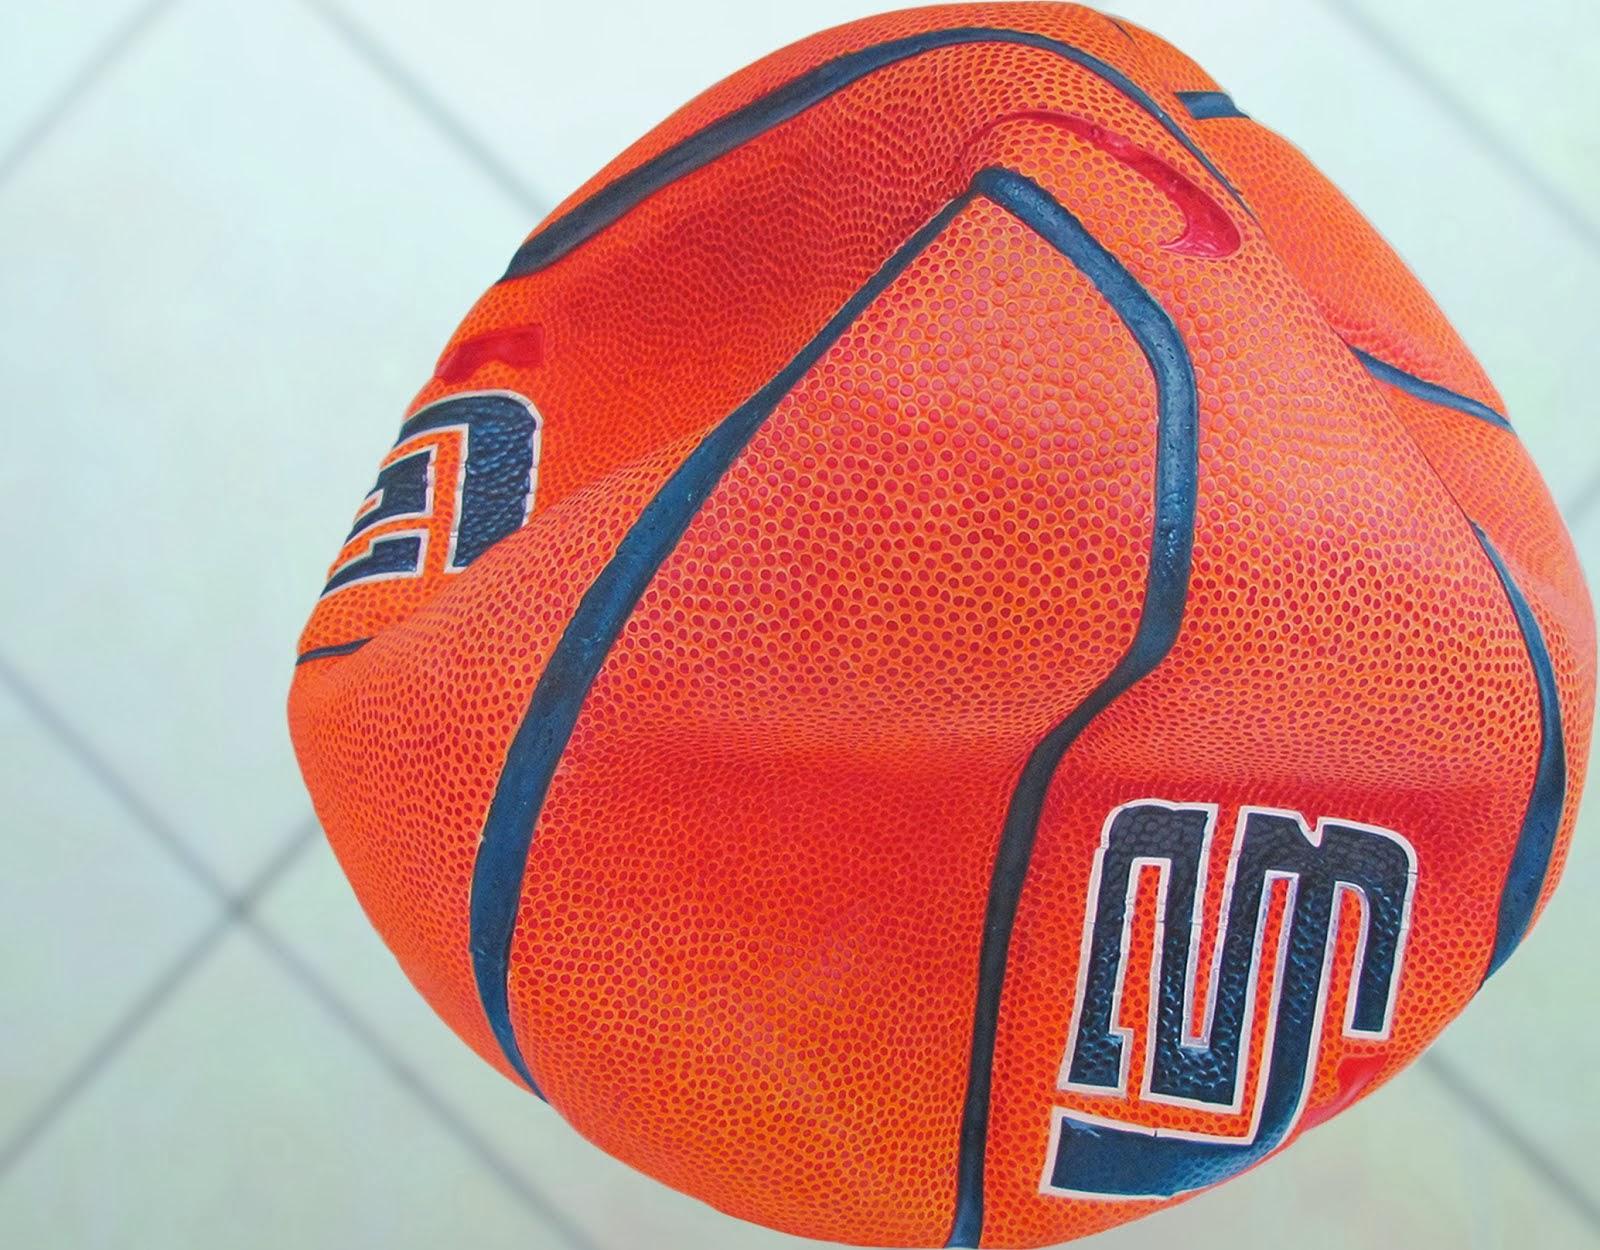 LB Ball 'kempis' #1..